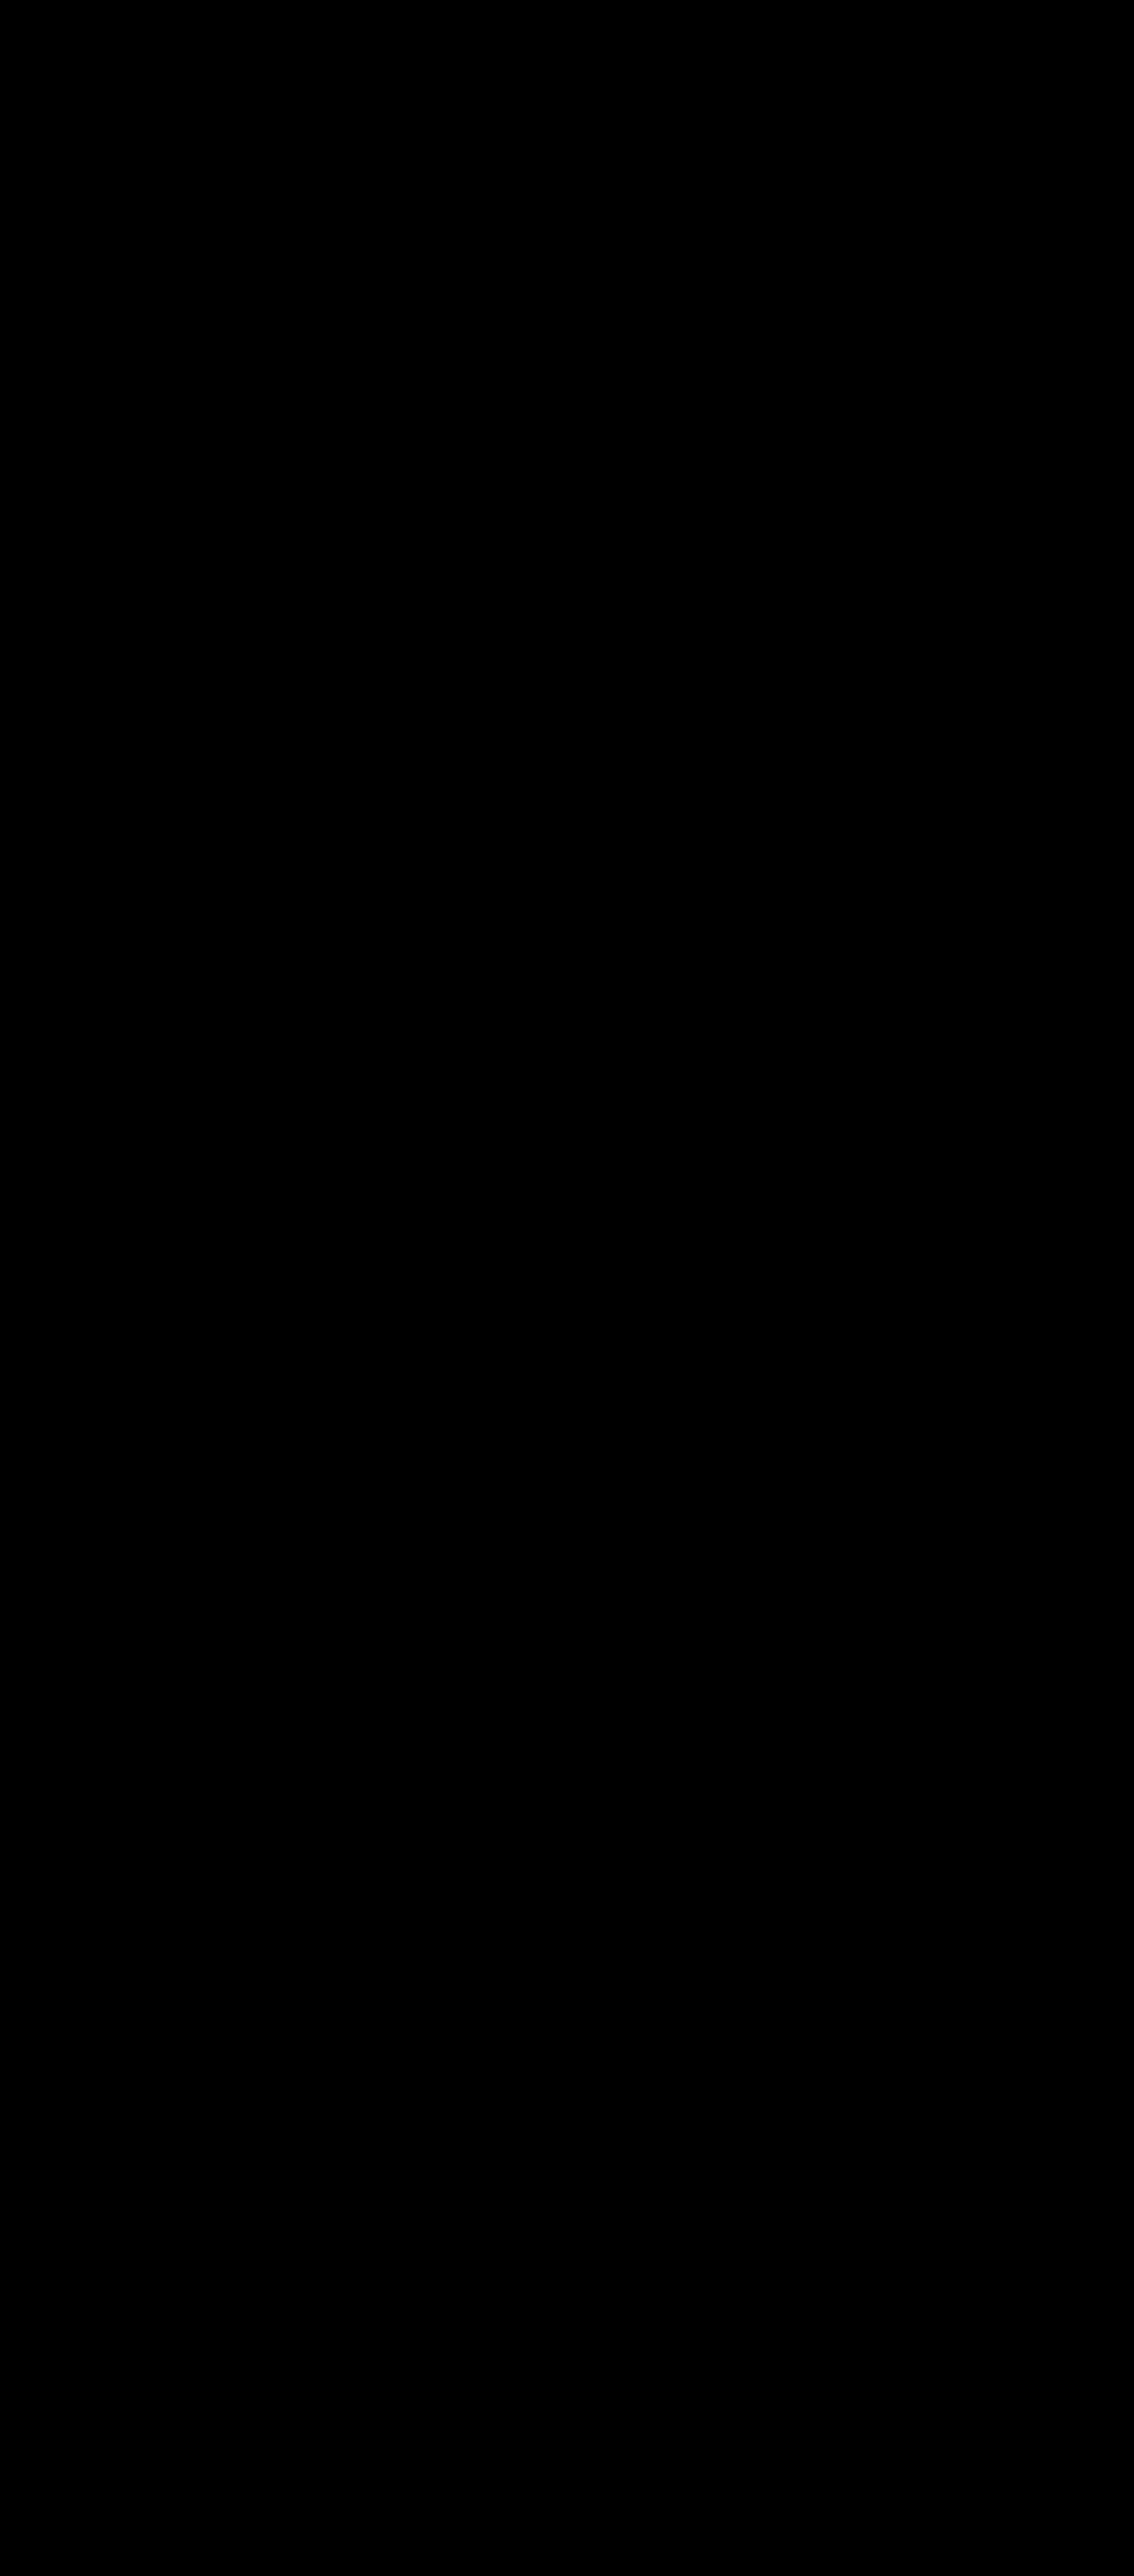 2000x4544 Fileband Silhouette 01.svg